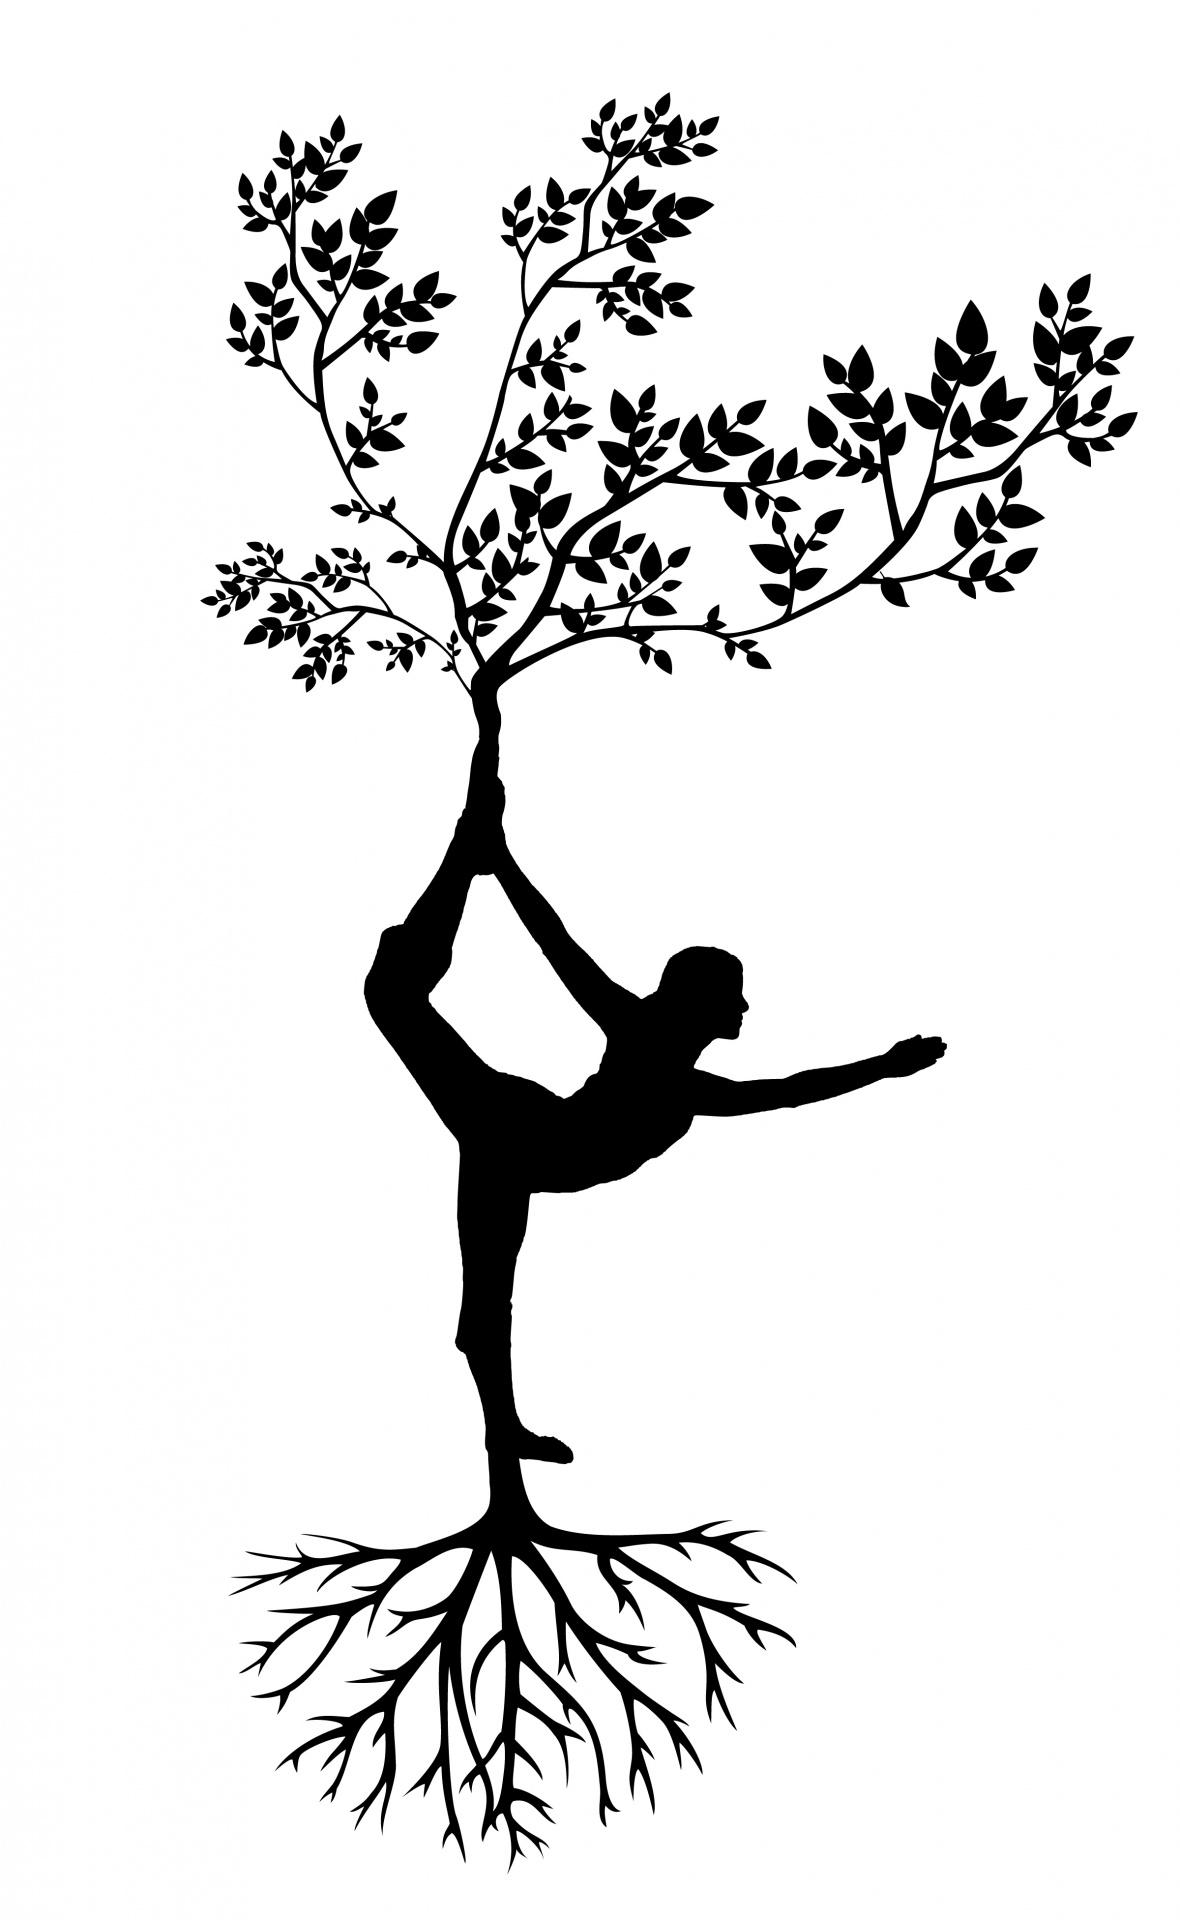 yoga-1516166497RBajpg